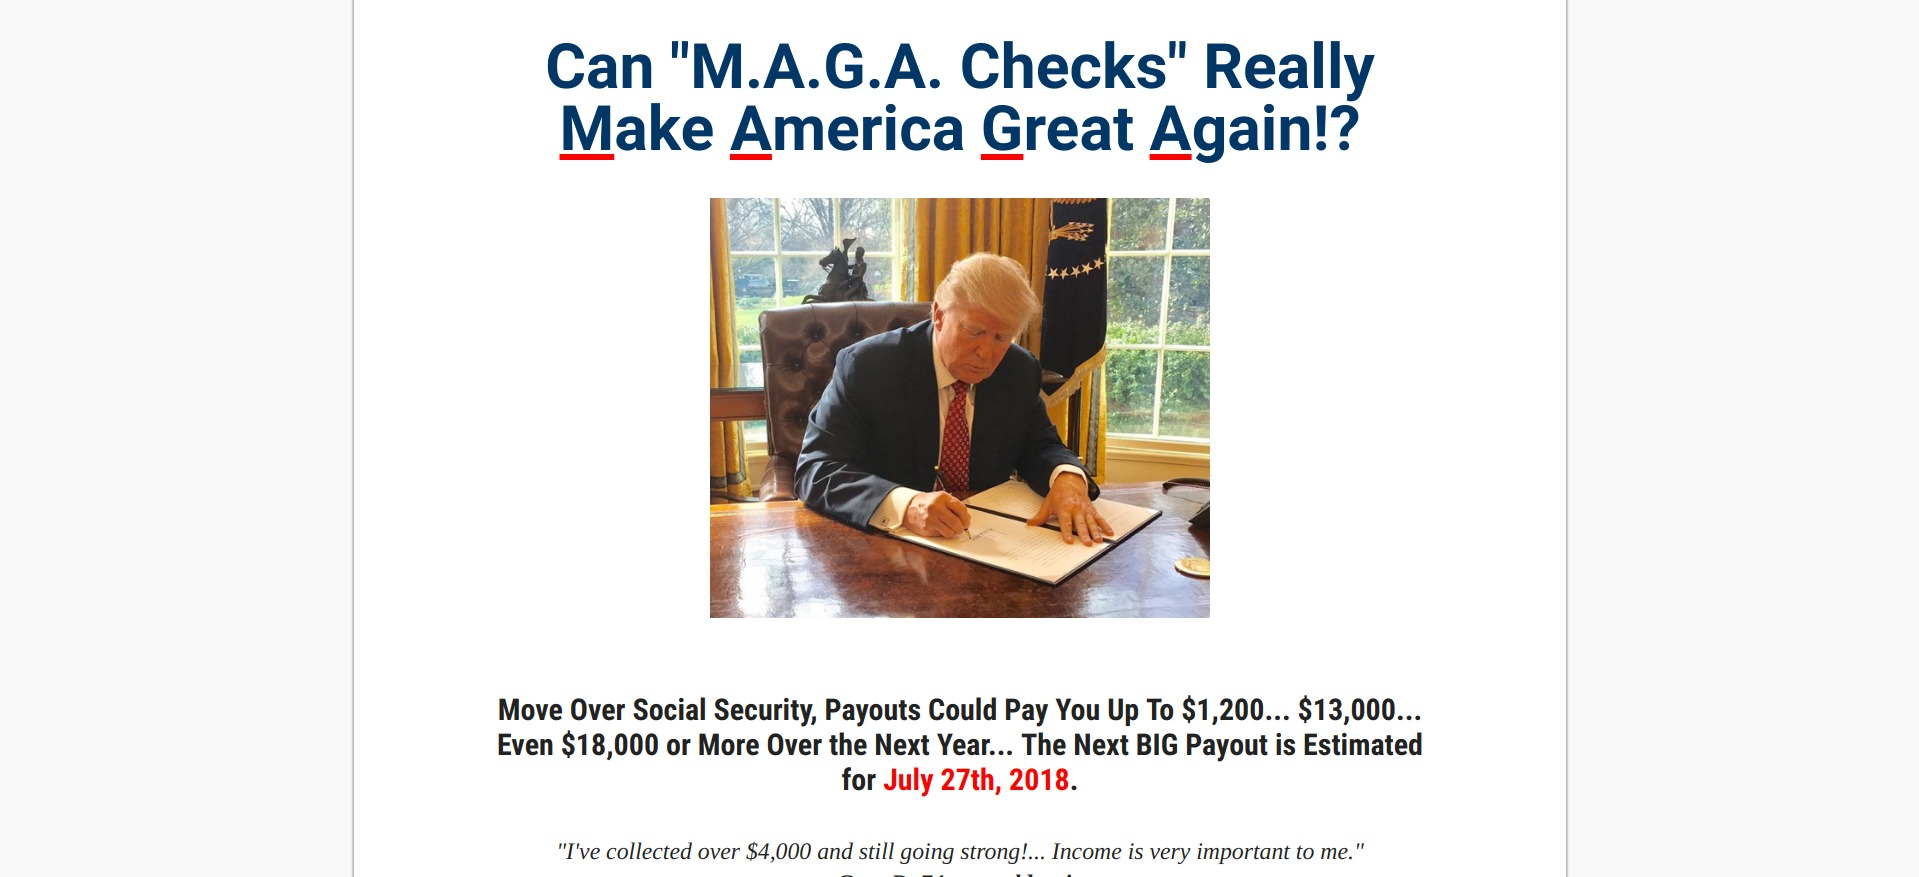 Maga Checks Scam or Legit